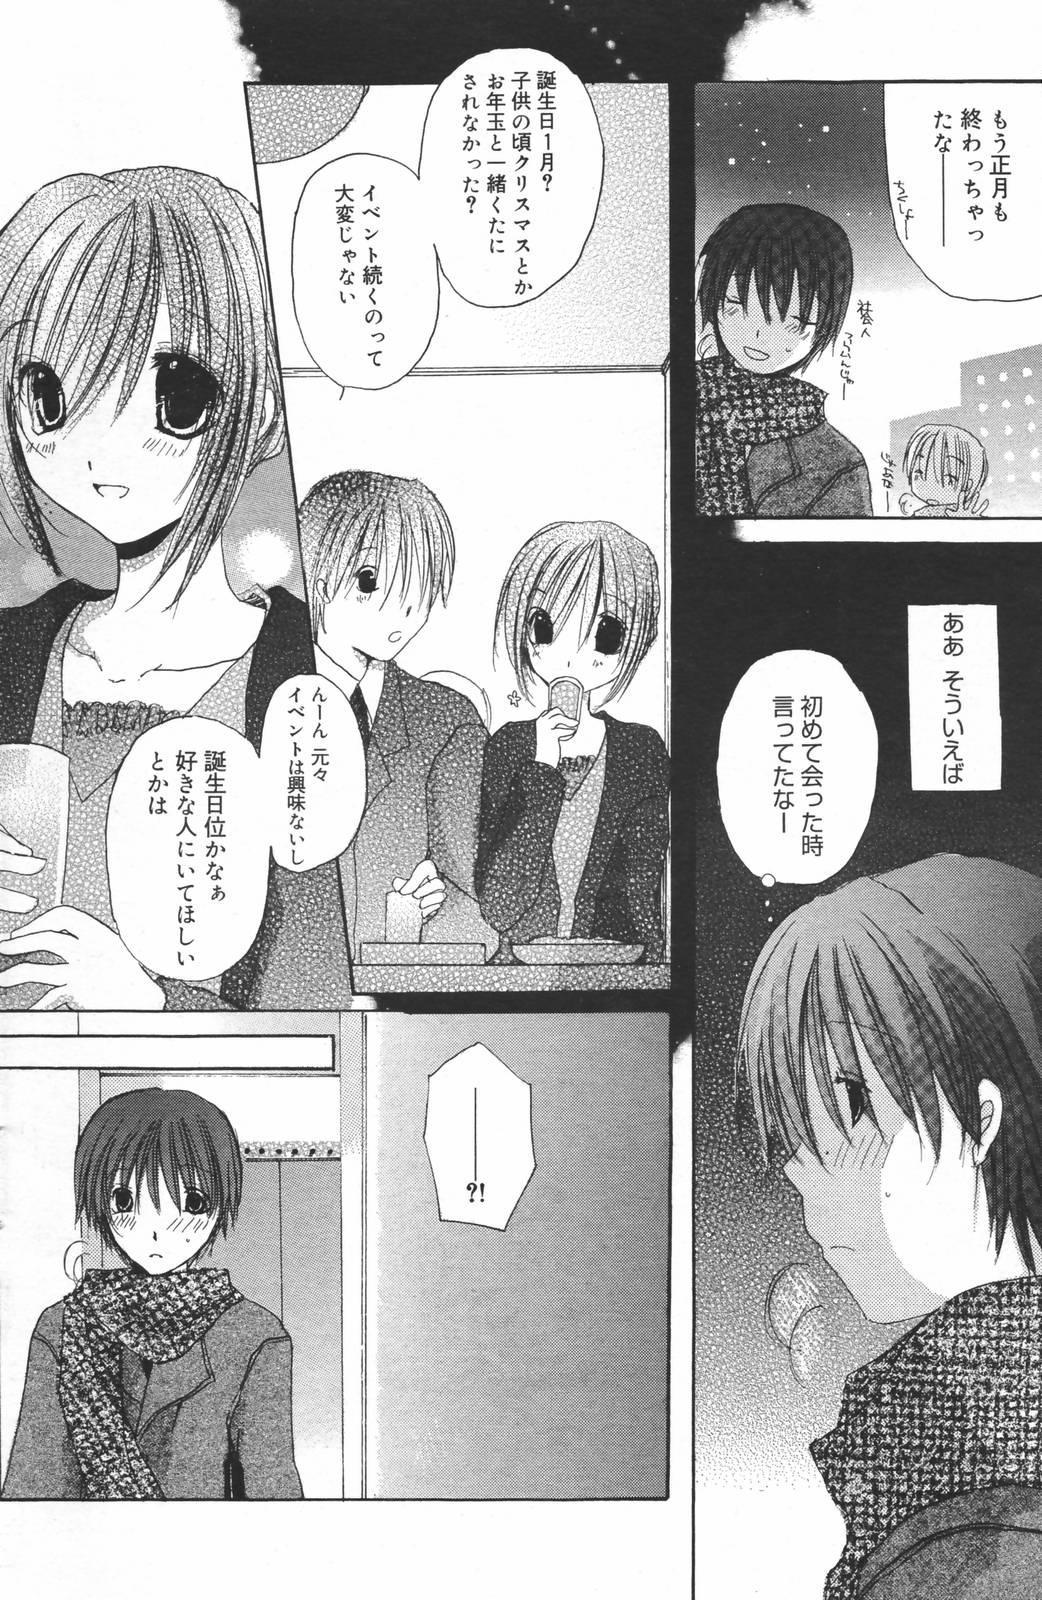 Manga Bangaichi 2007-03 113